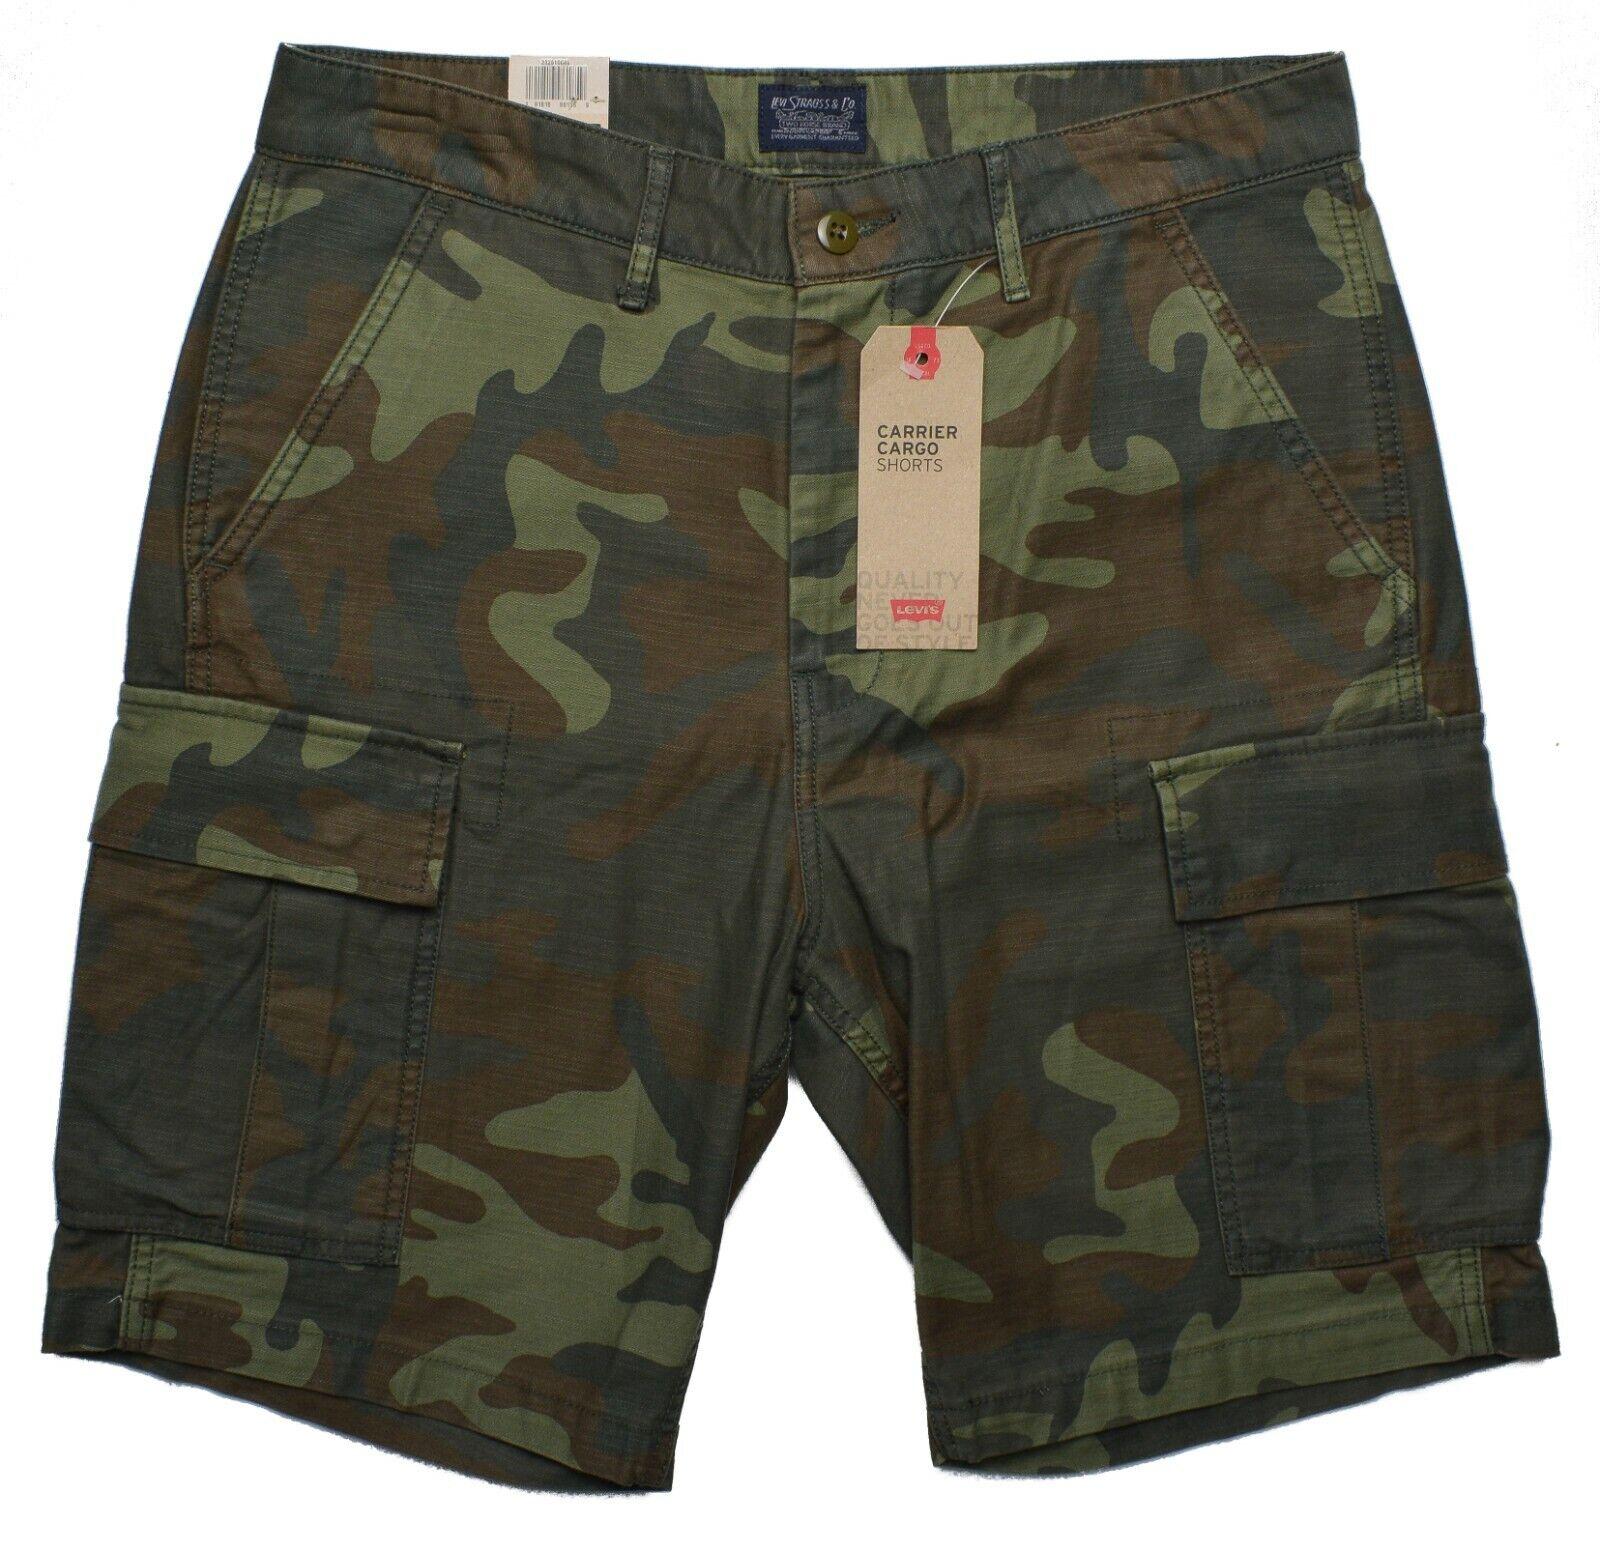 Levi's #10102 NEW Men's Camouflage 100% Cotton Carrier Cargo